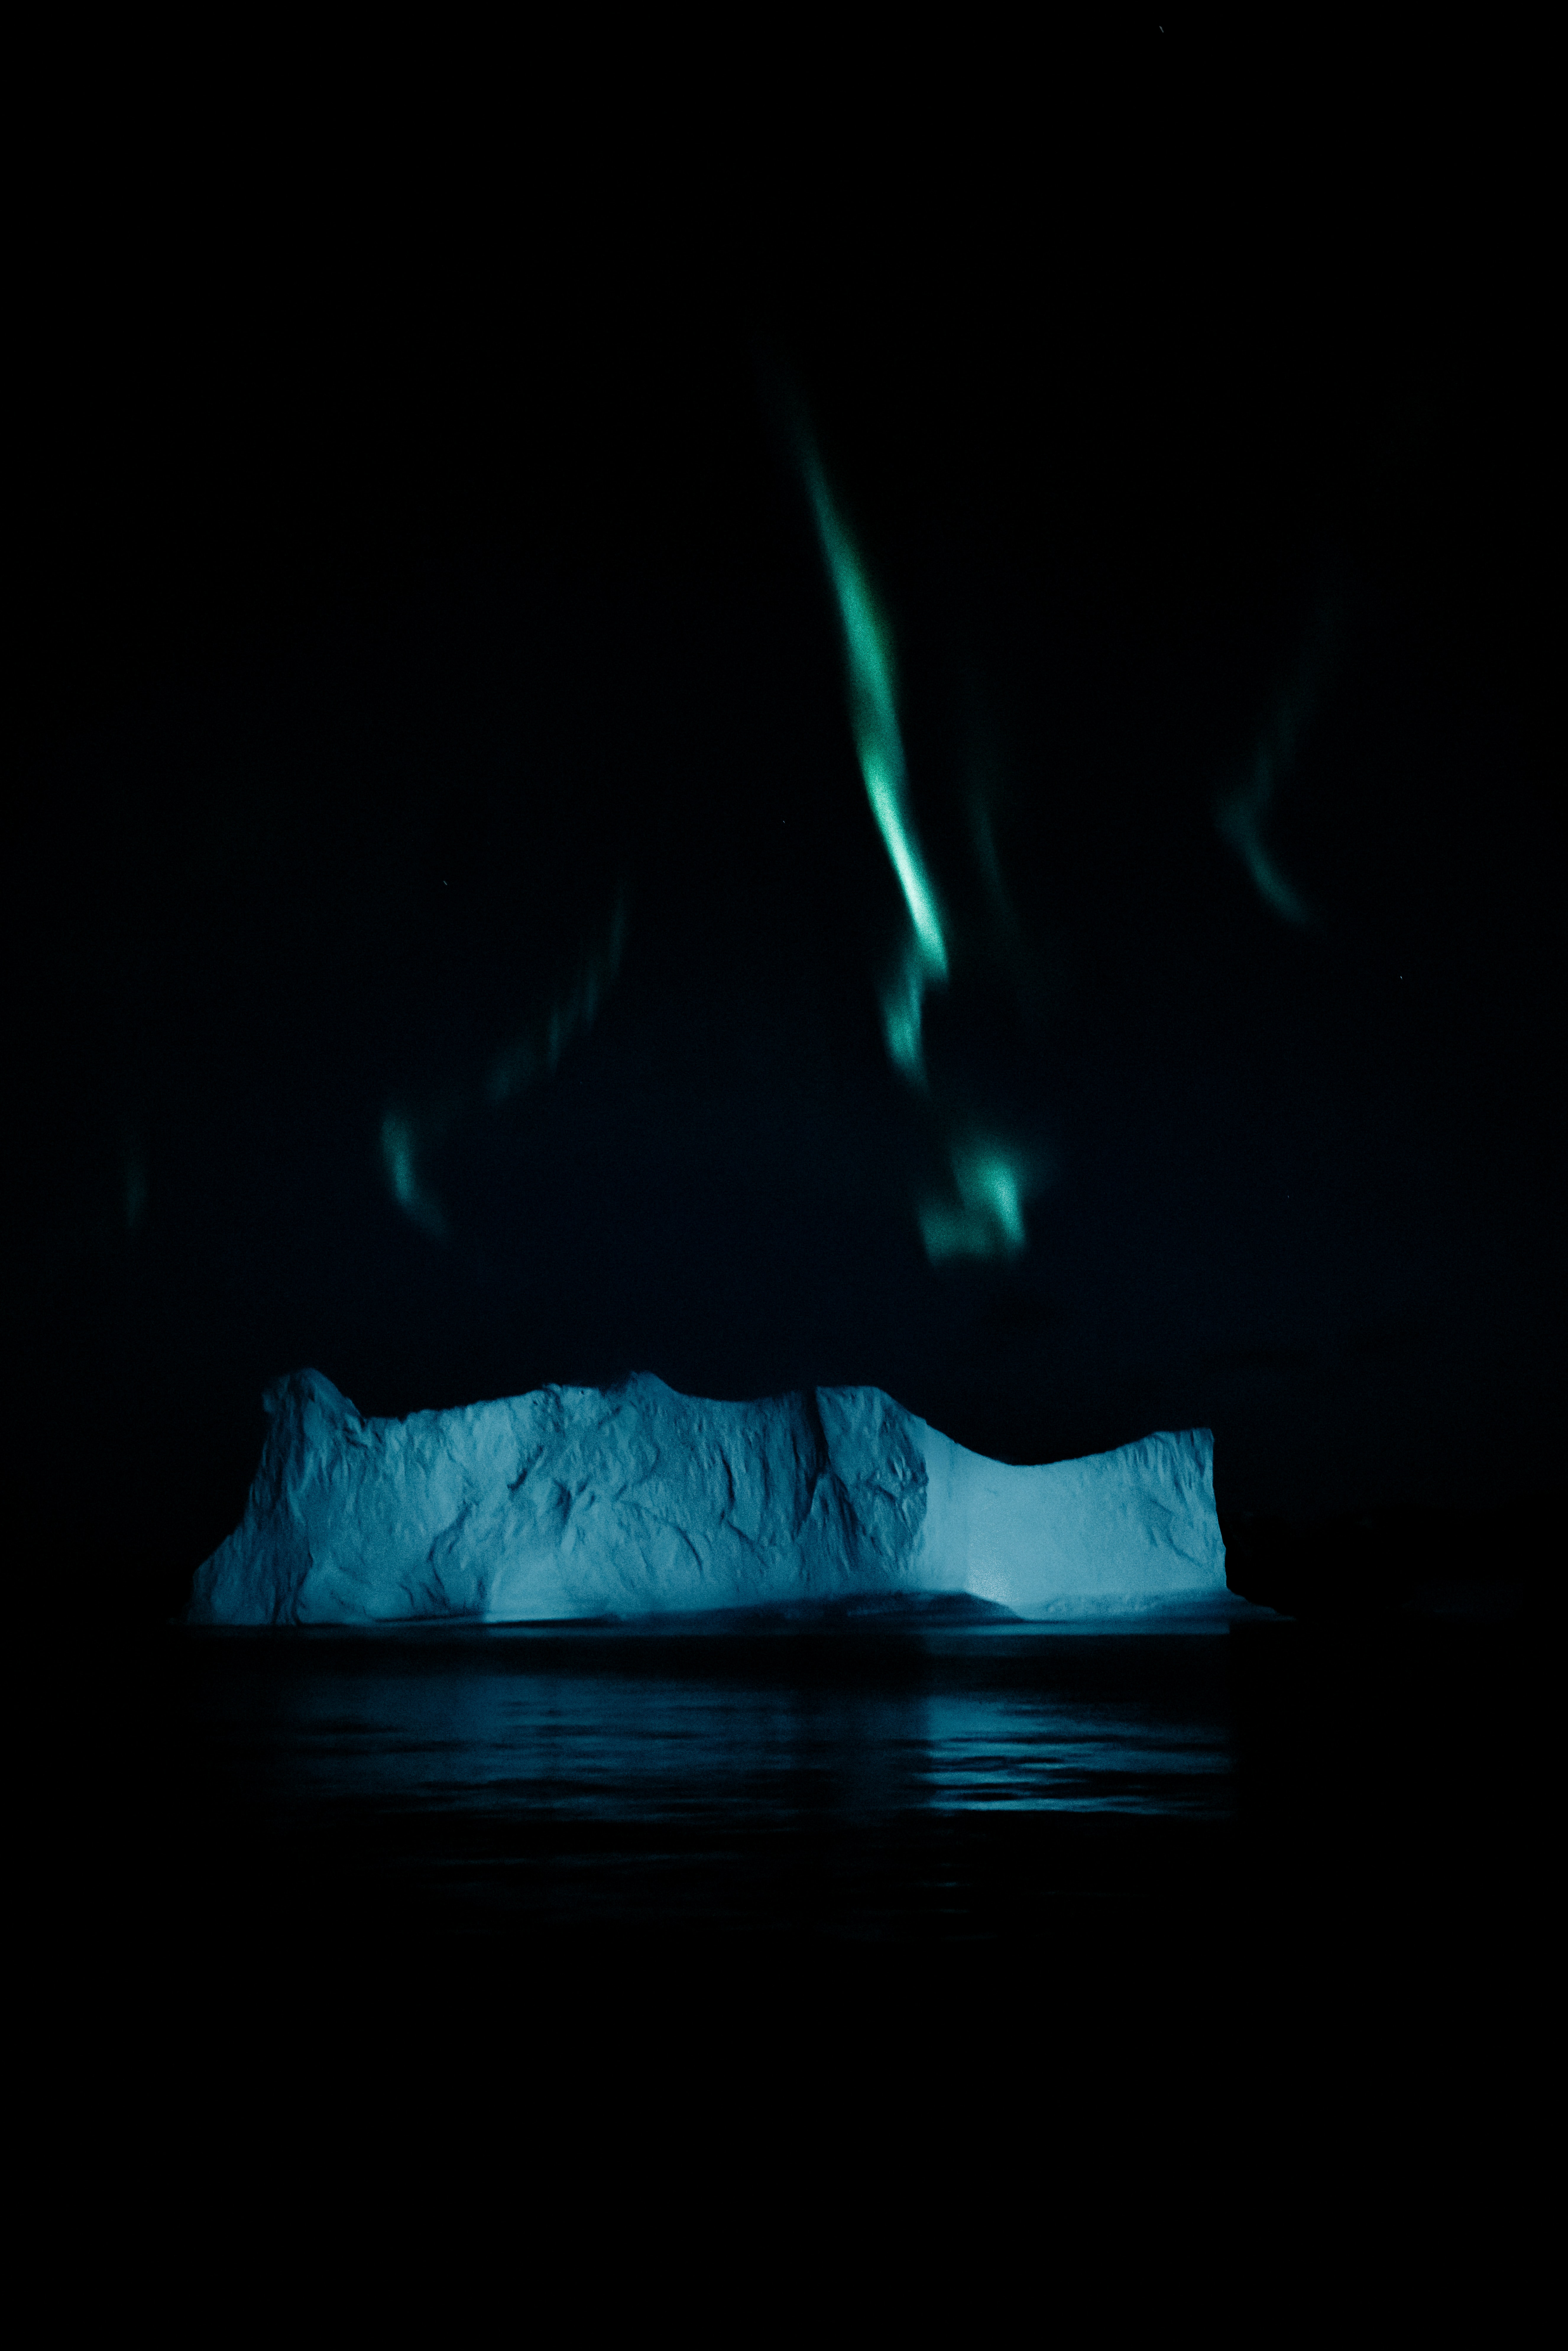 ice berg and aurora borealis